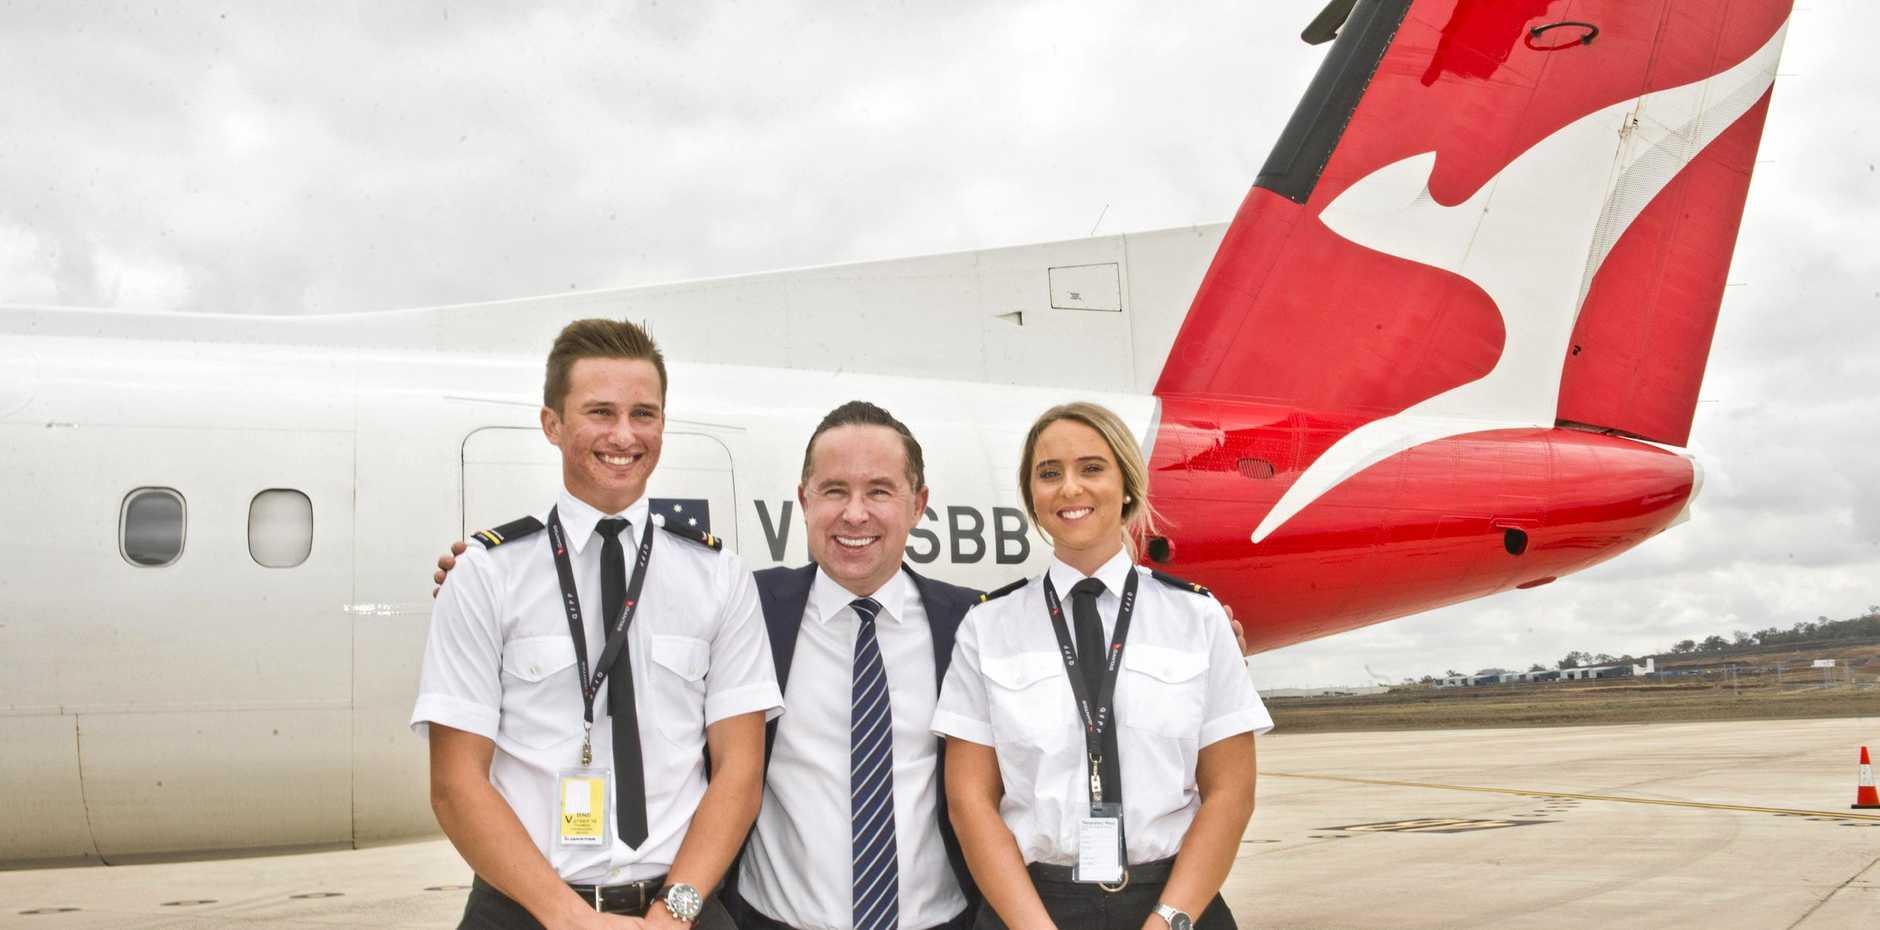 ( From left ) Tom Fanshaw, Qantas CEO Alan Joyce and Kimberley Pike. Qantas pilot training academy announced for Wellcamp airport. Thursday, 27th Sep, 2018.